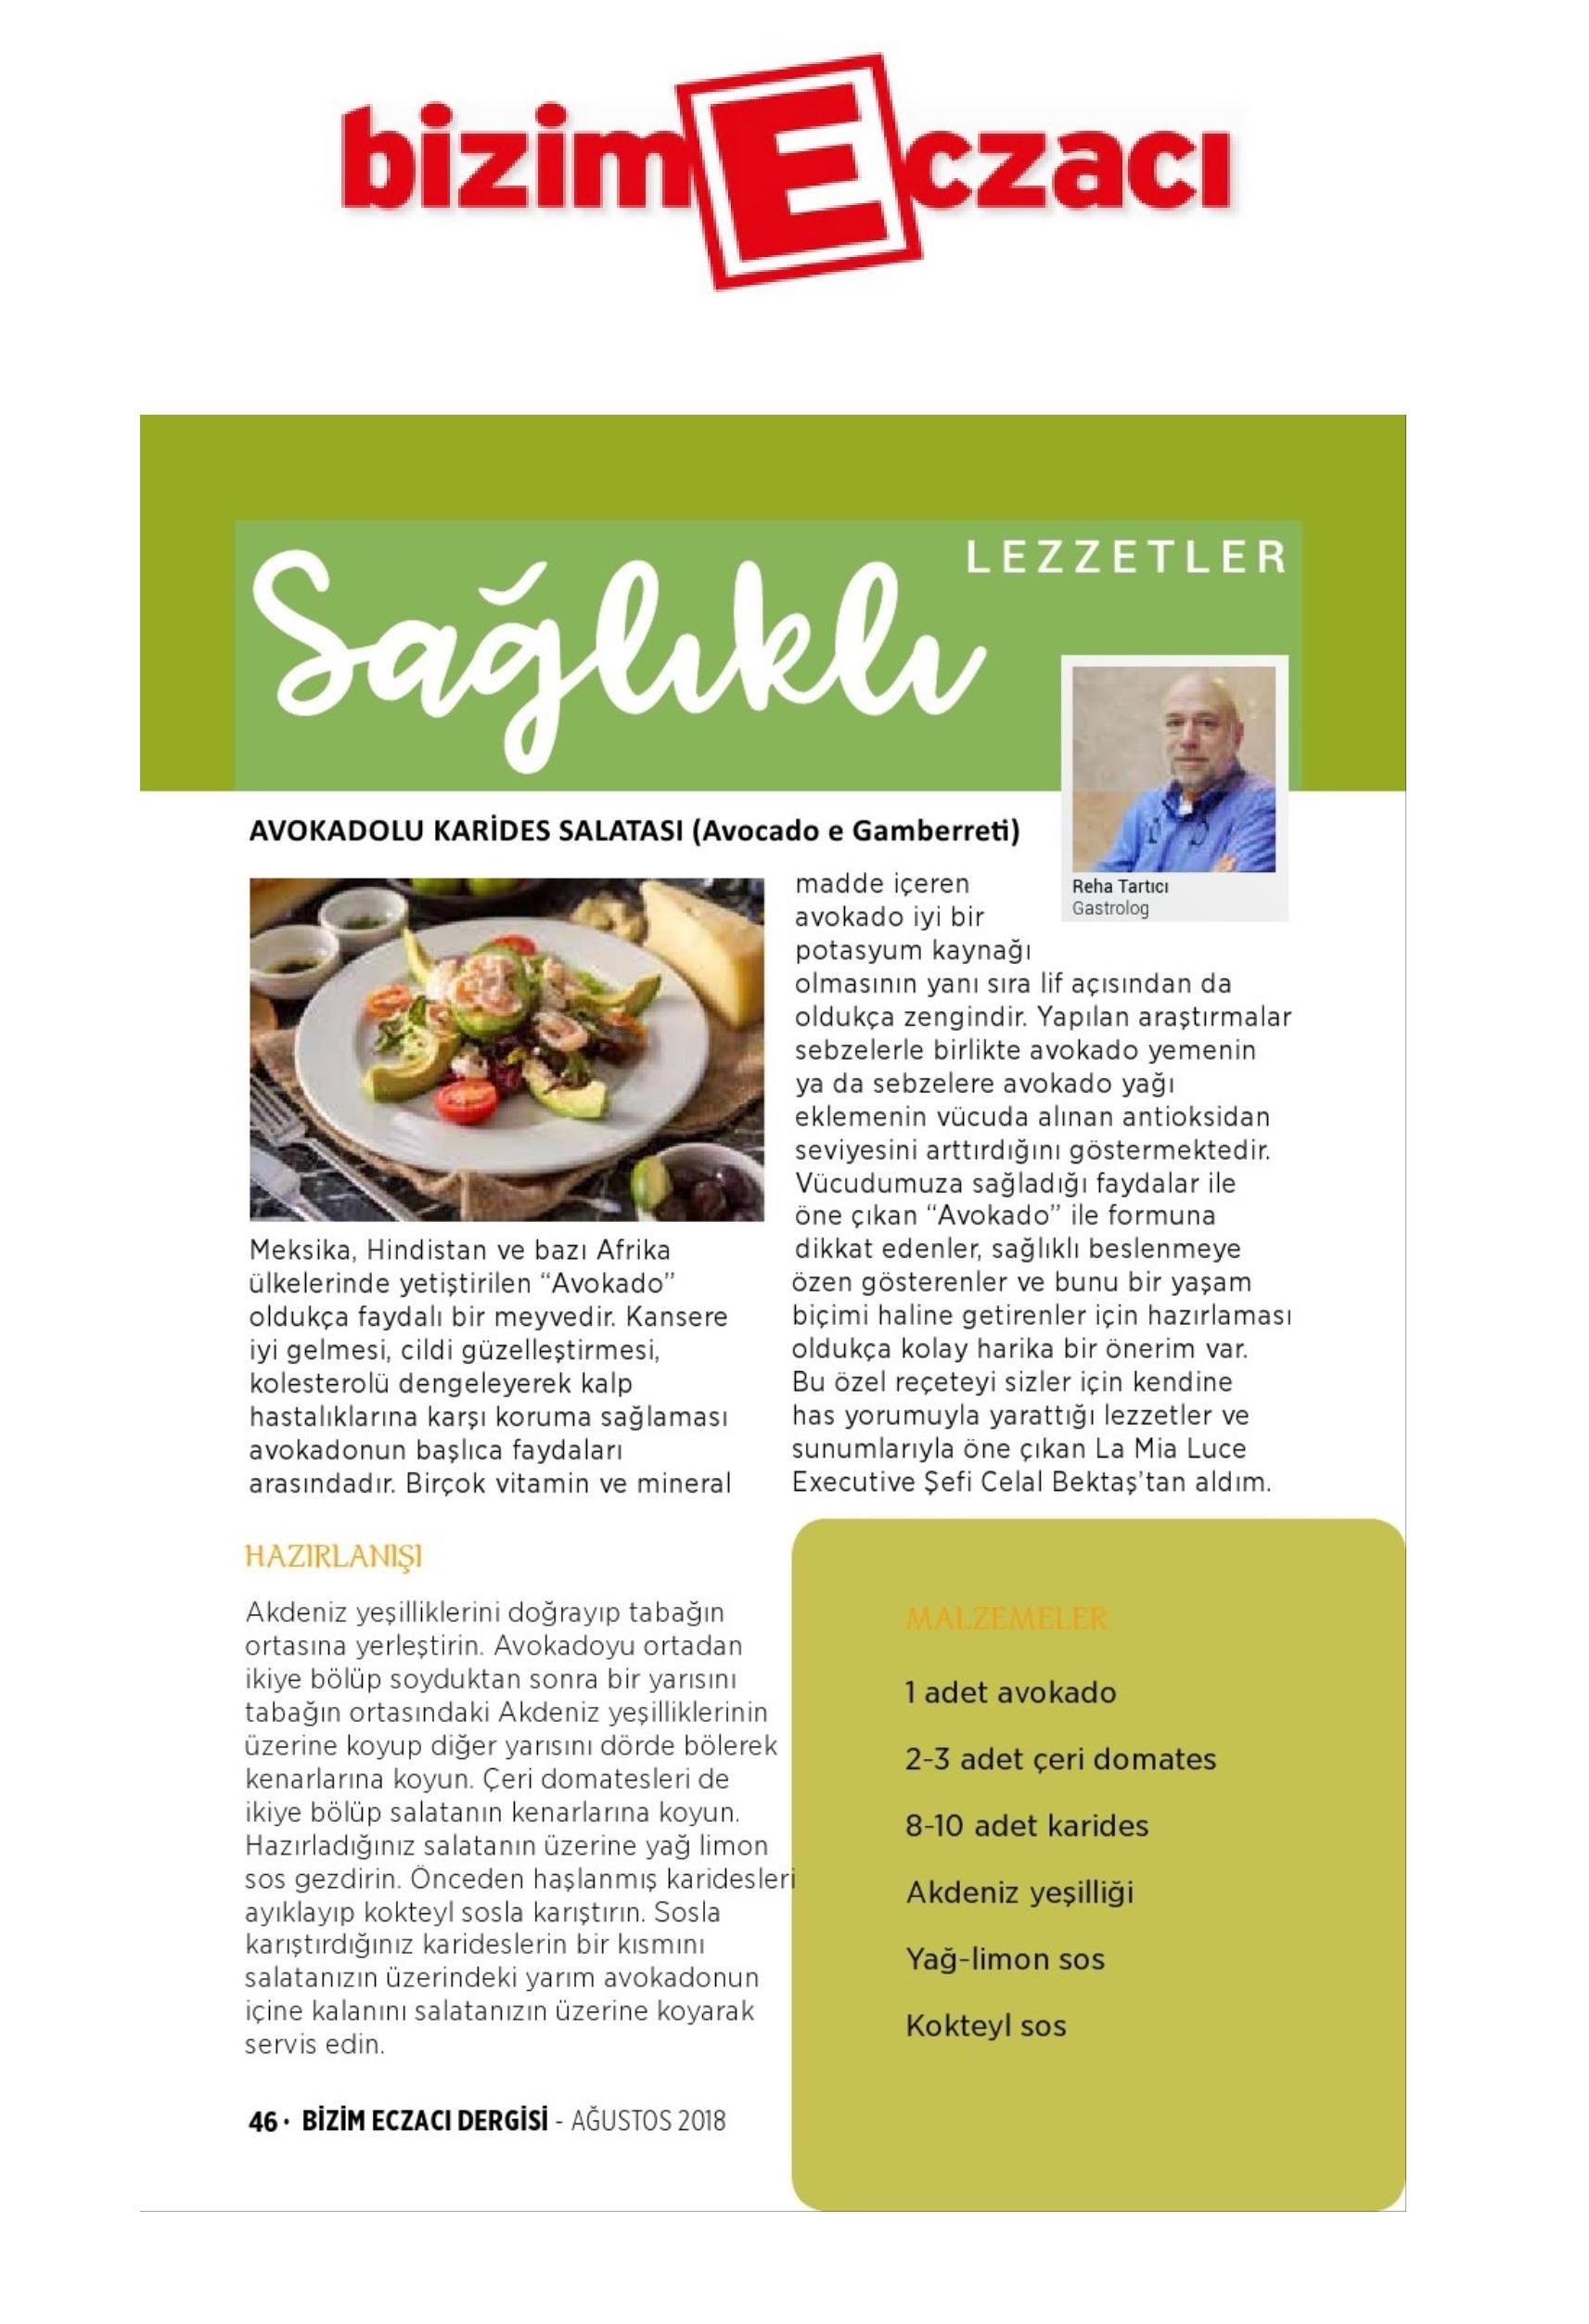 BİZİM ECZACI 2018-08-01